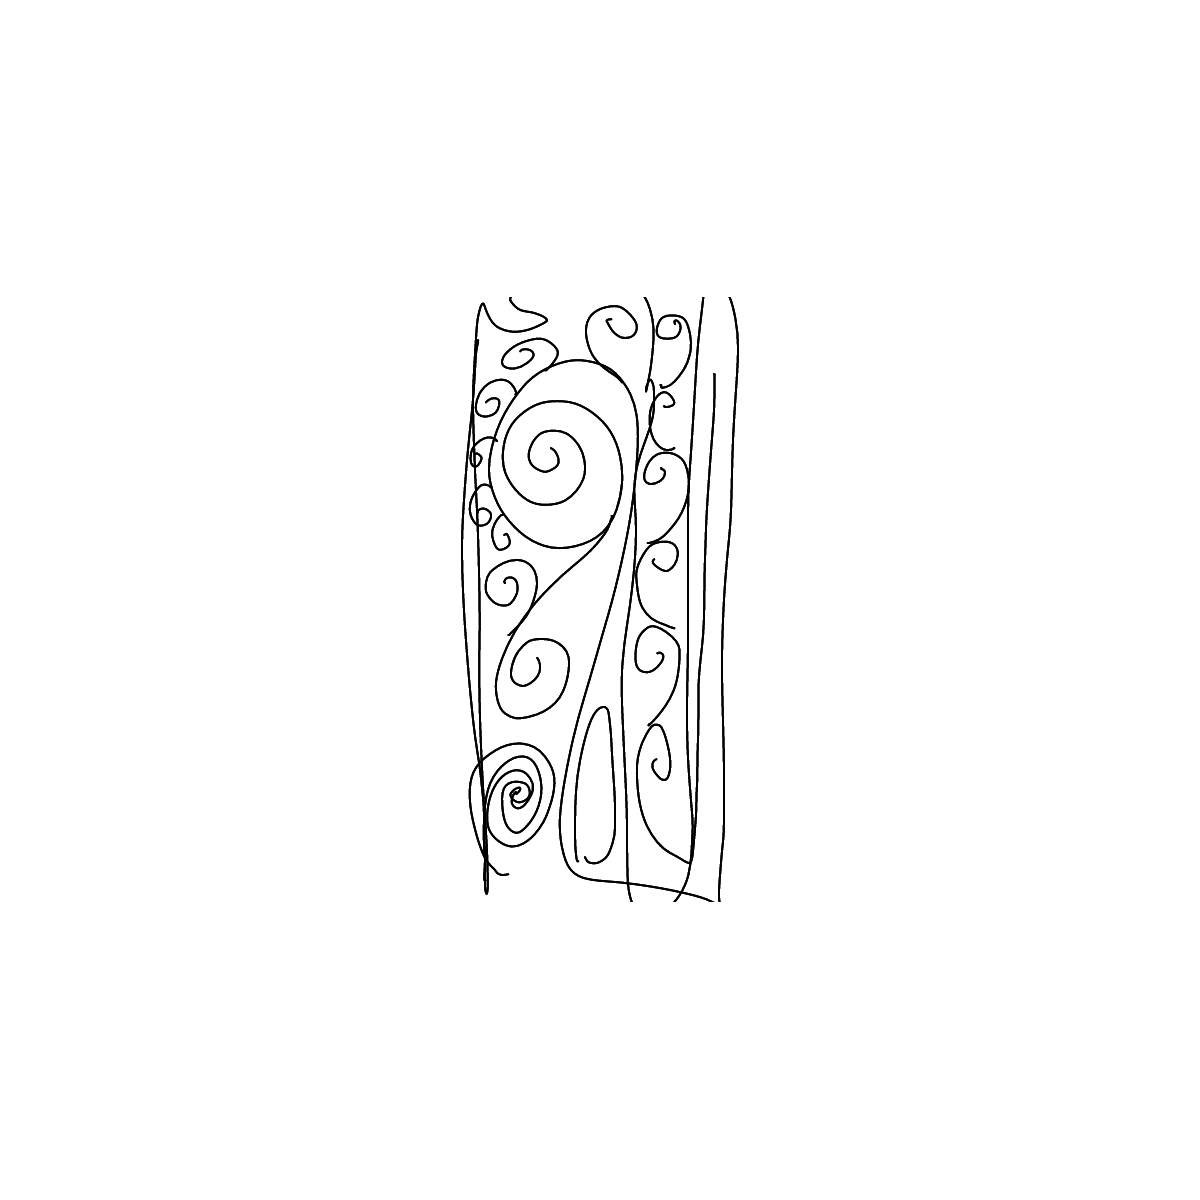 BAAAM drawing#9009 lat:60.4561042785644500lng: 22.2536735534667970